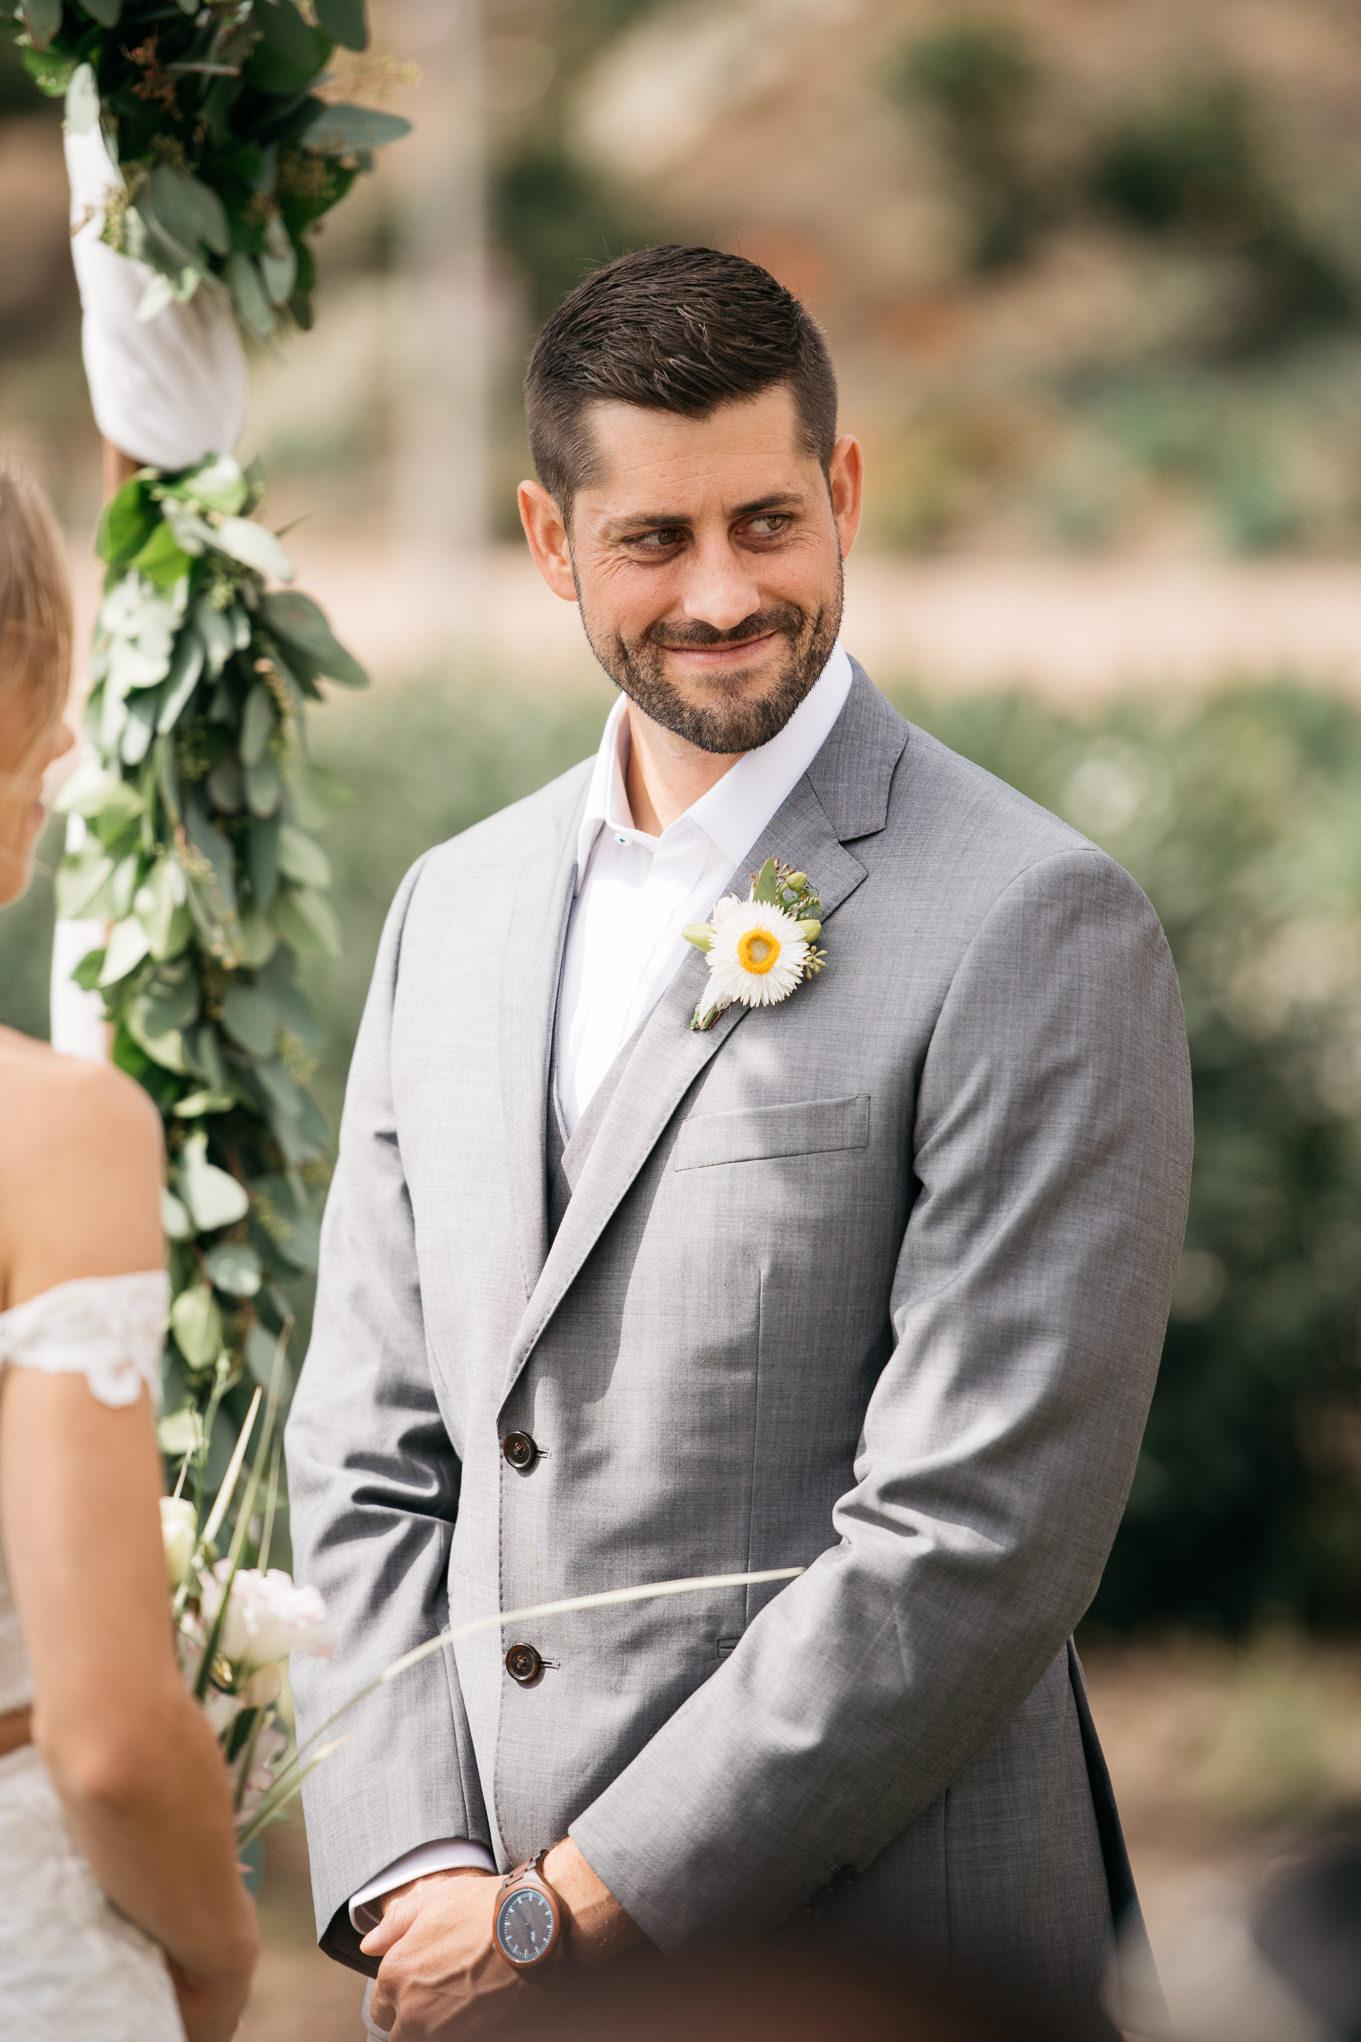 218_ONL_Jenny_Ken_Wedding_Trevor_Hooper_Photo.jpg